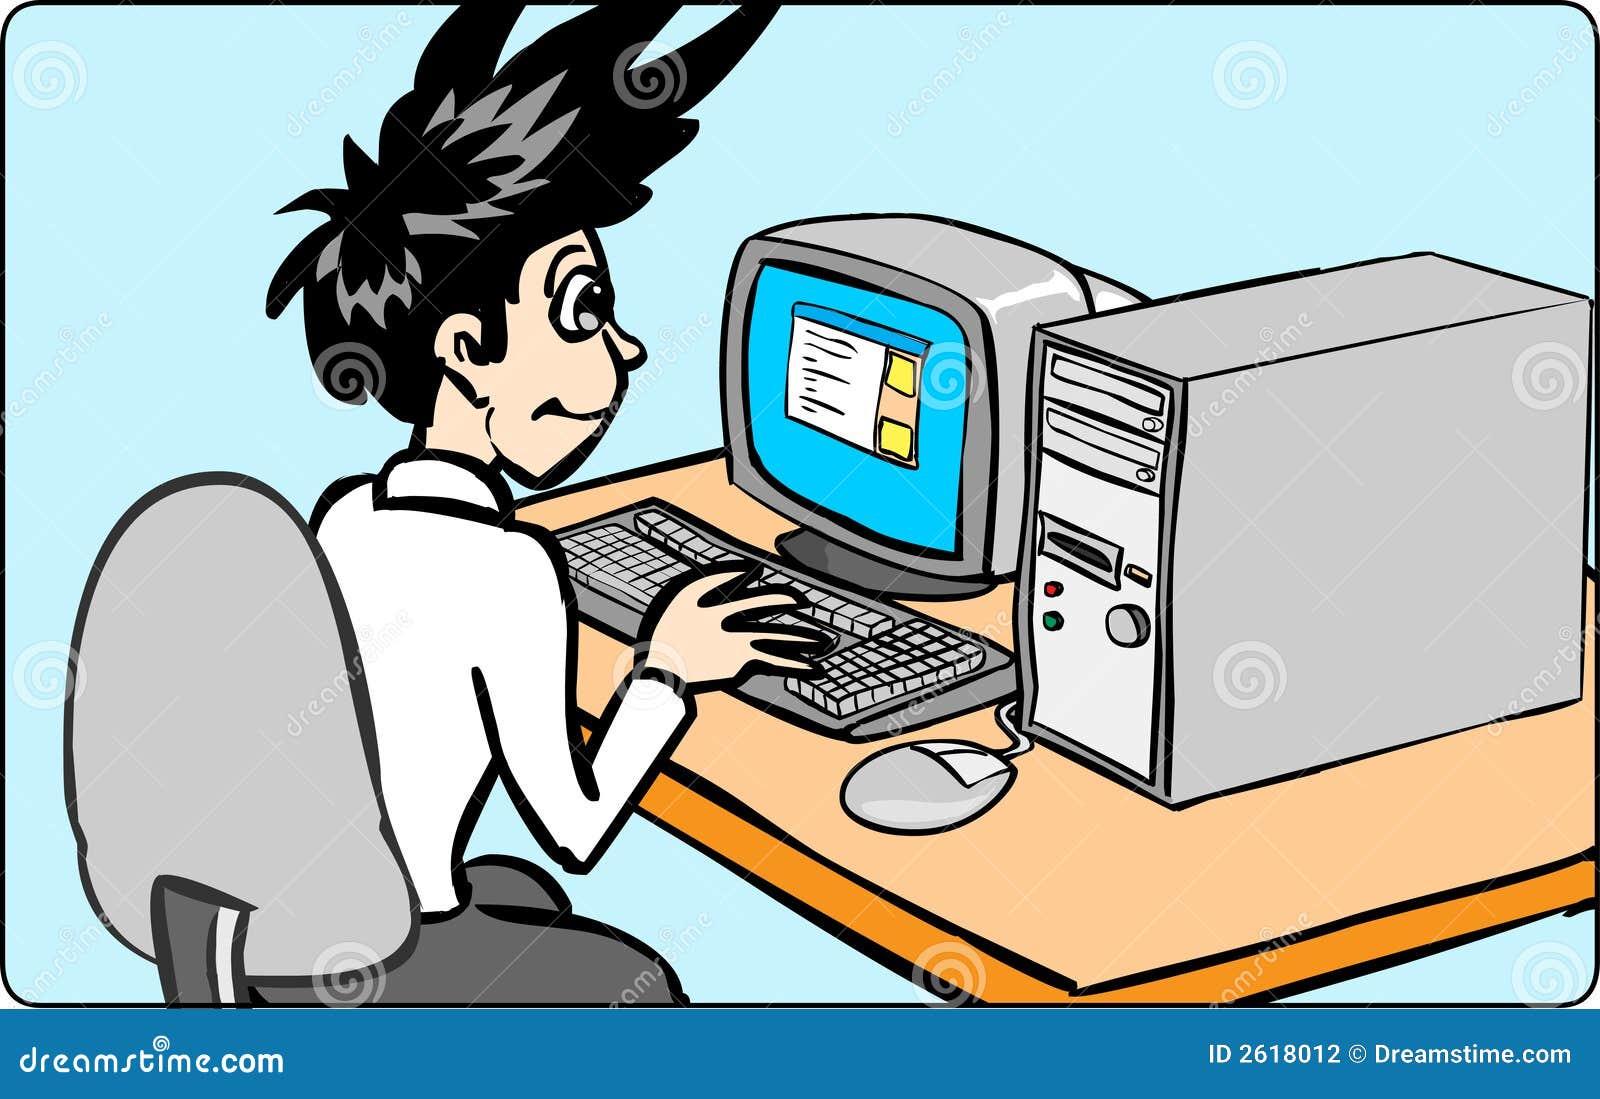 computer work clipart - photo #23